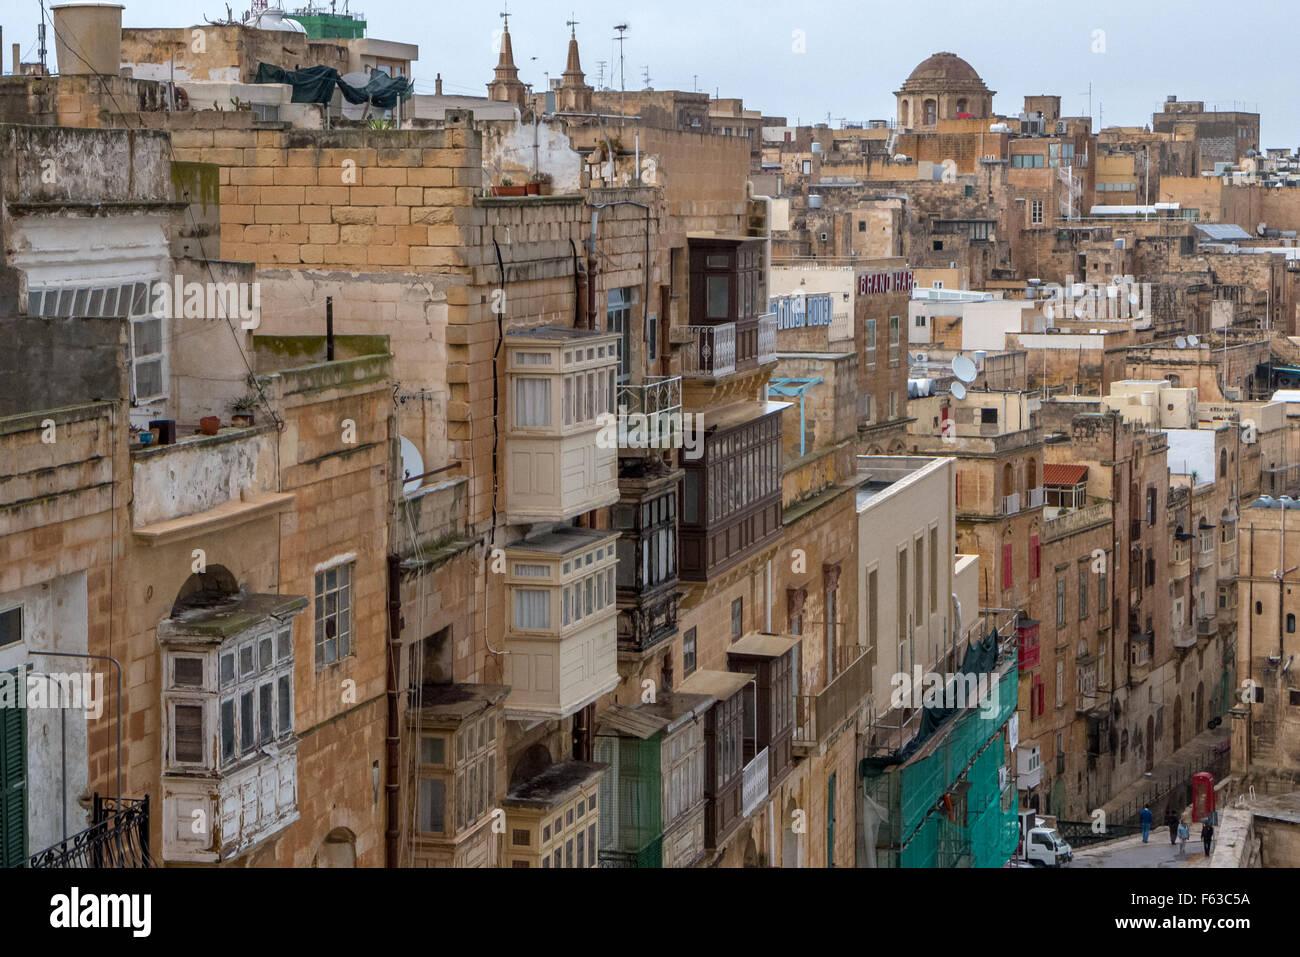 Balconies and general cityscape in Valletta, Malta. - Stock Image